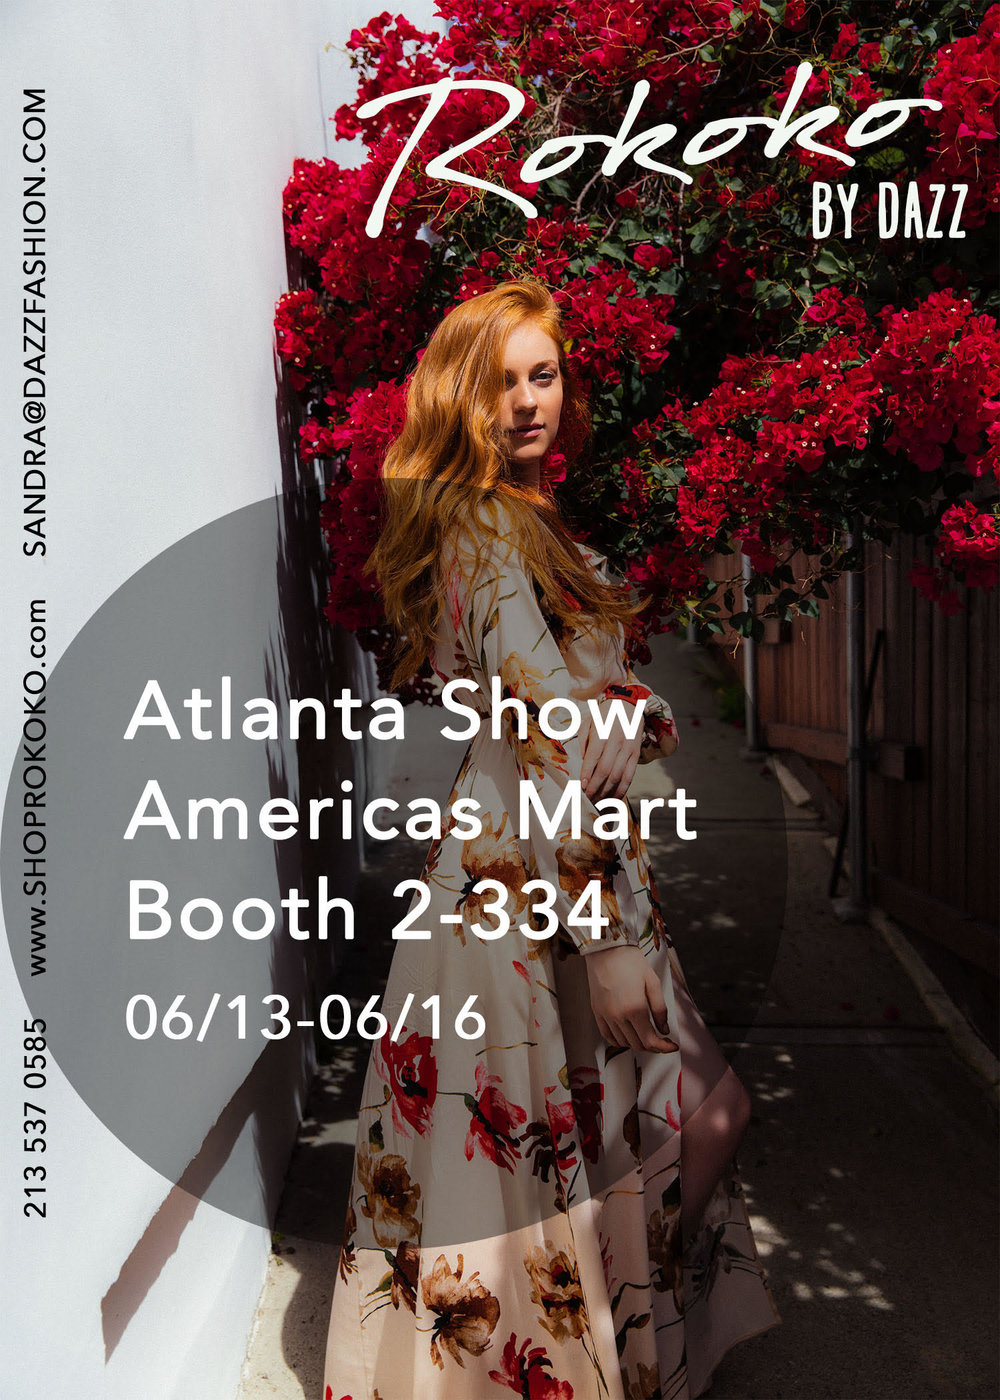 atlanta show 1 060518.jpg